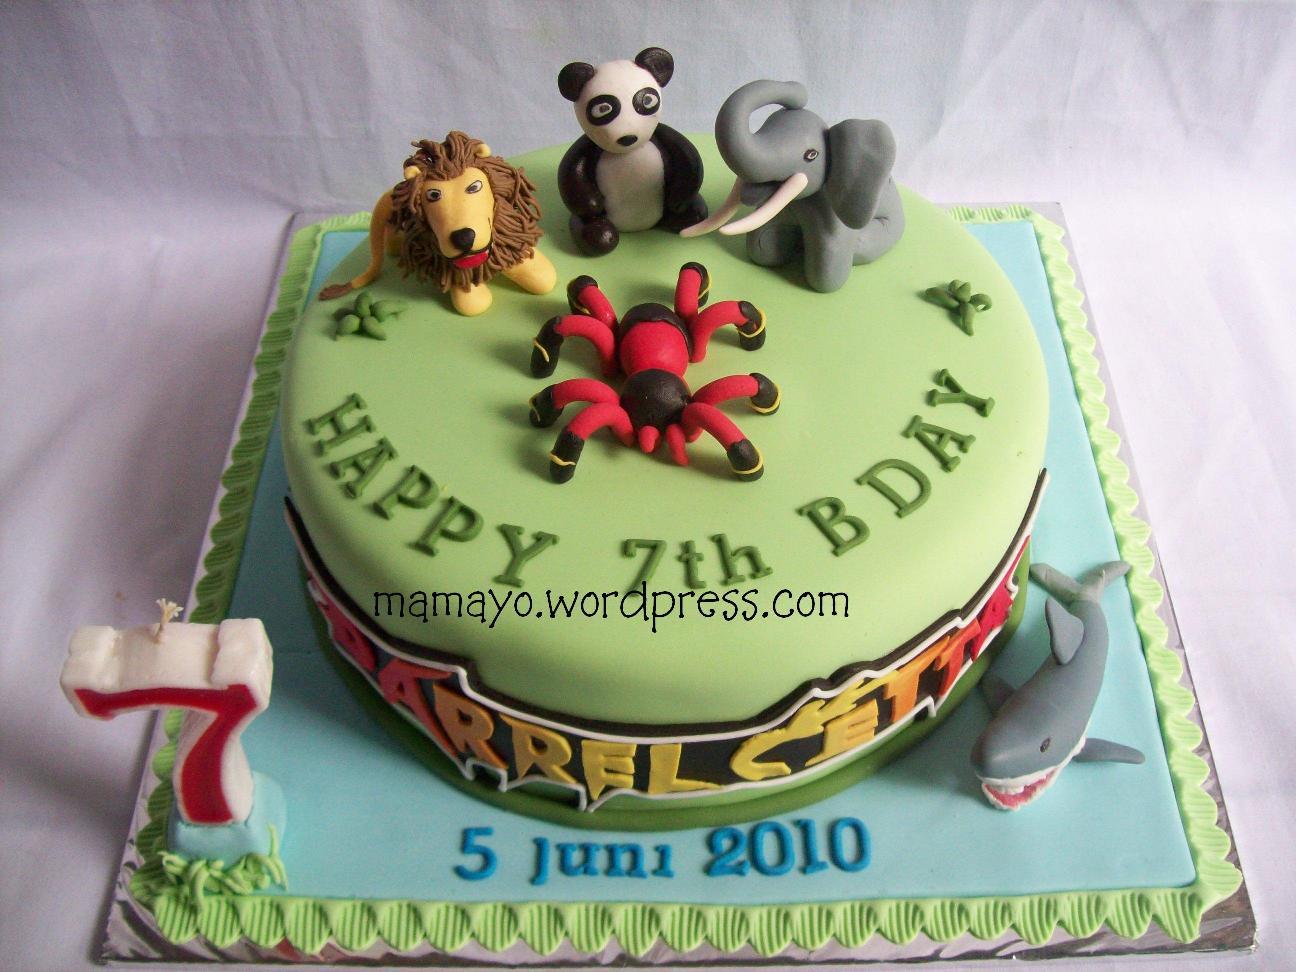 Birthday Cake For My Girl Image Inspiration of Cake and Birthday